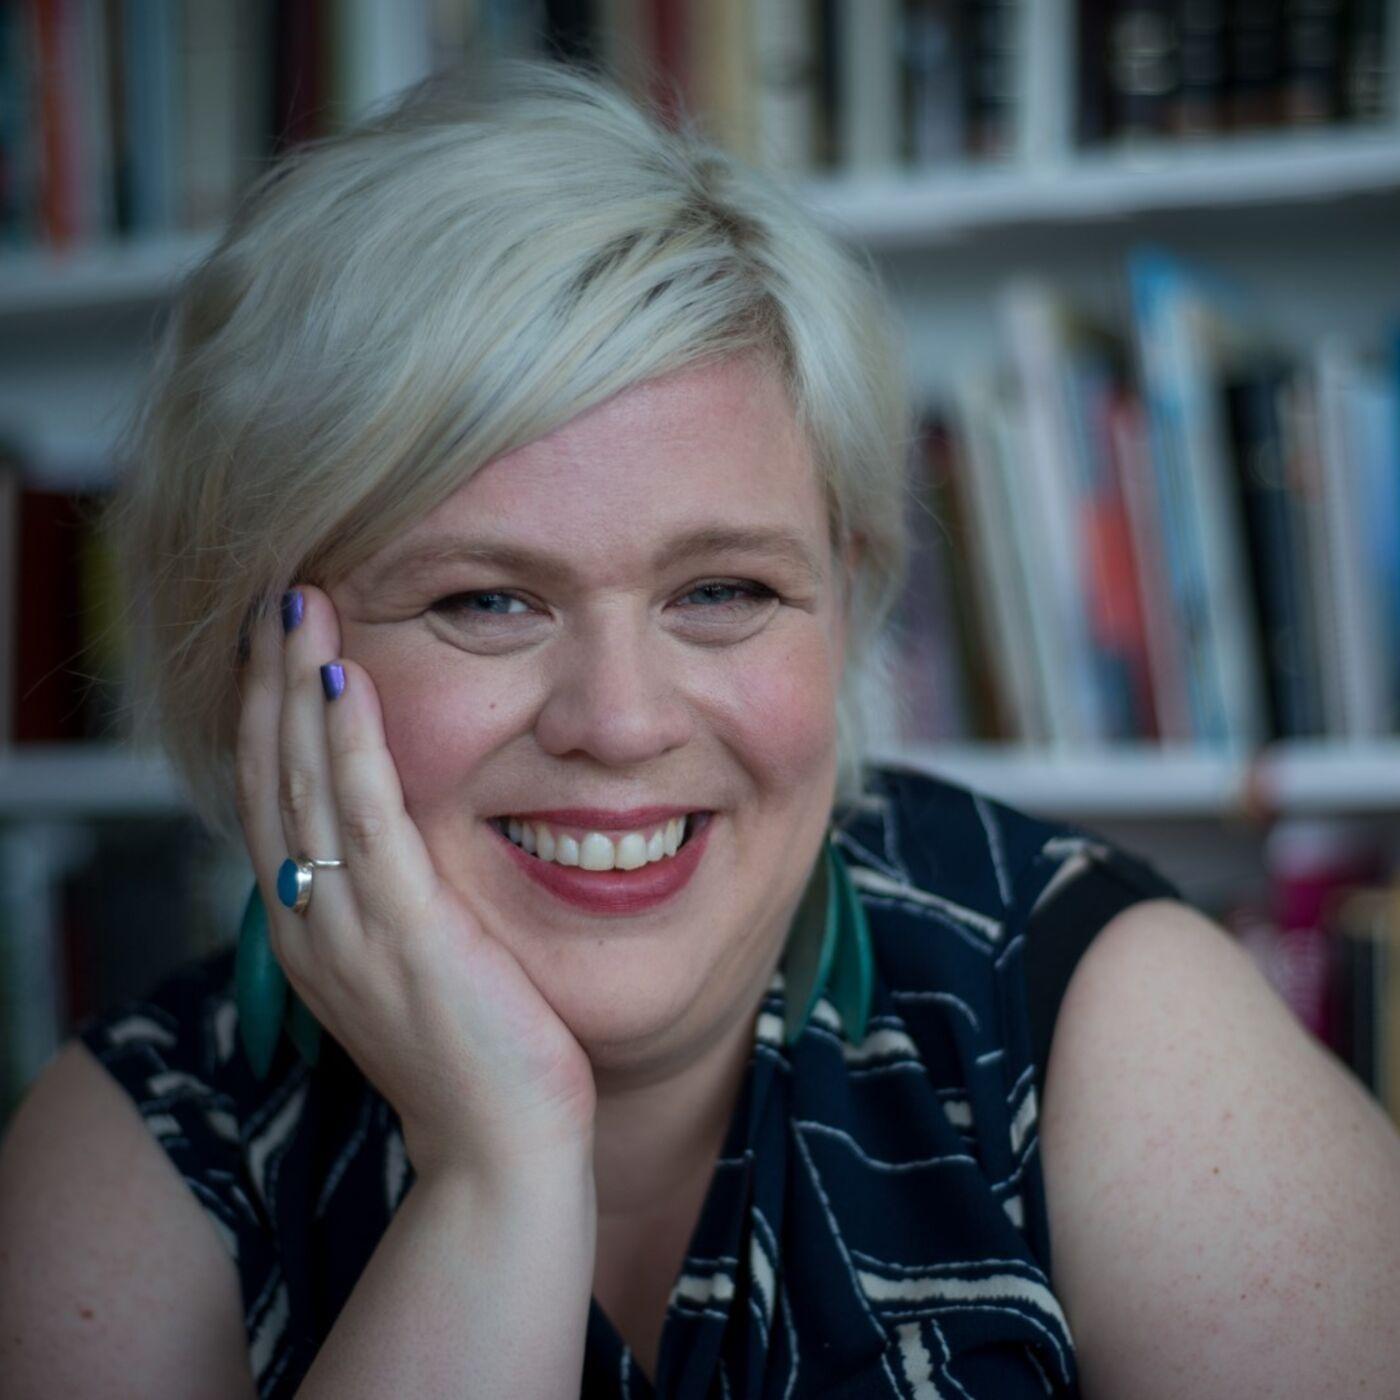 Iceland strives toward closing the Gender Gap - with Brynhildur, Secretary General of Icelandic Women's Rights Association